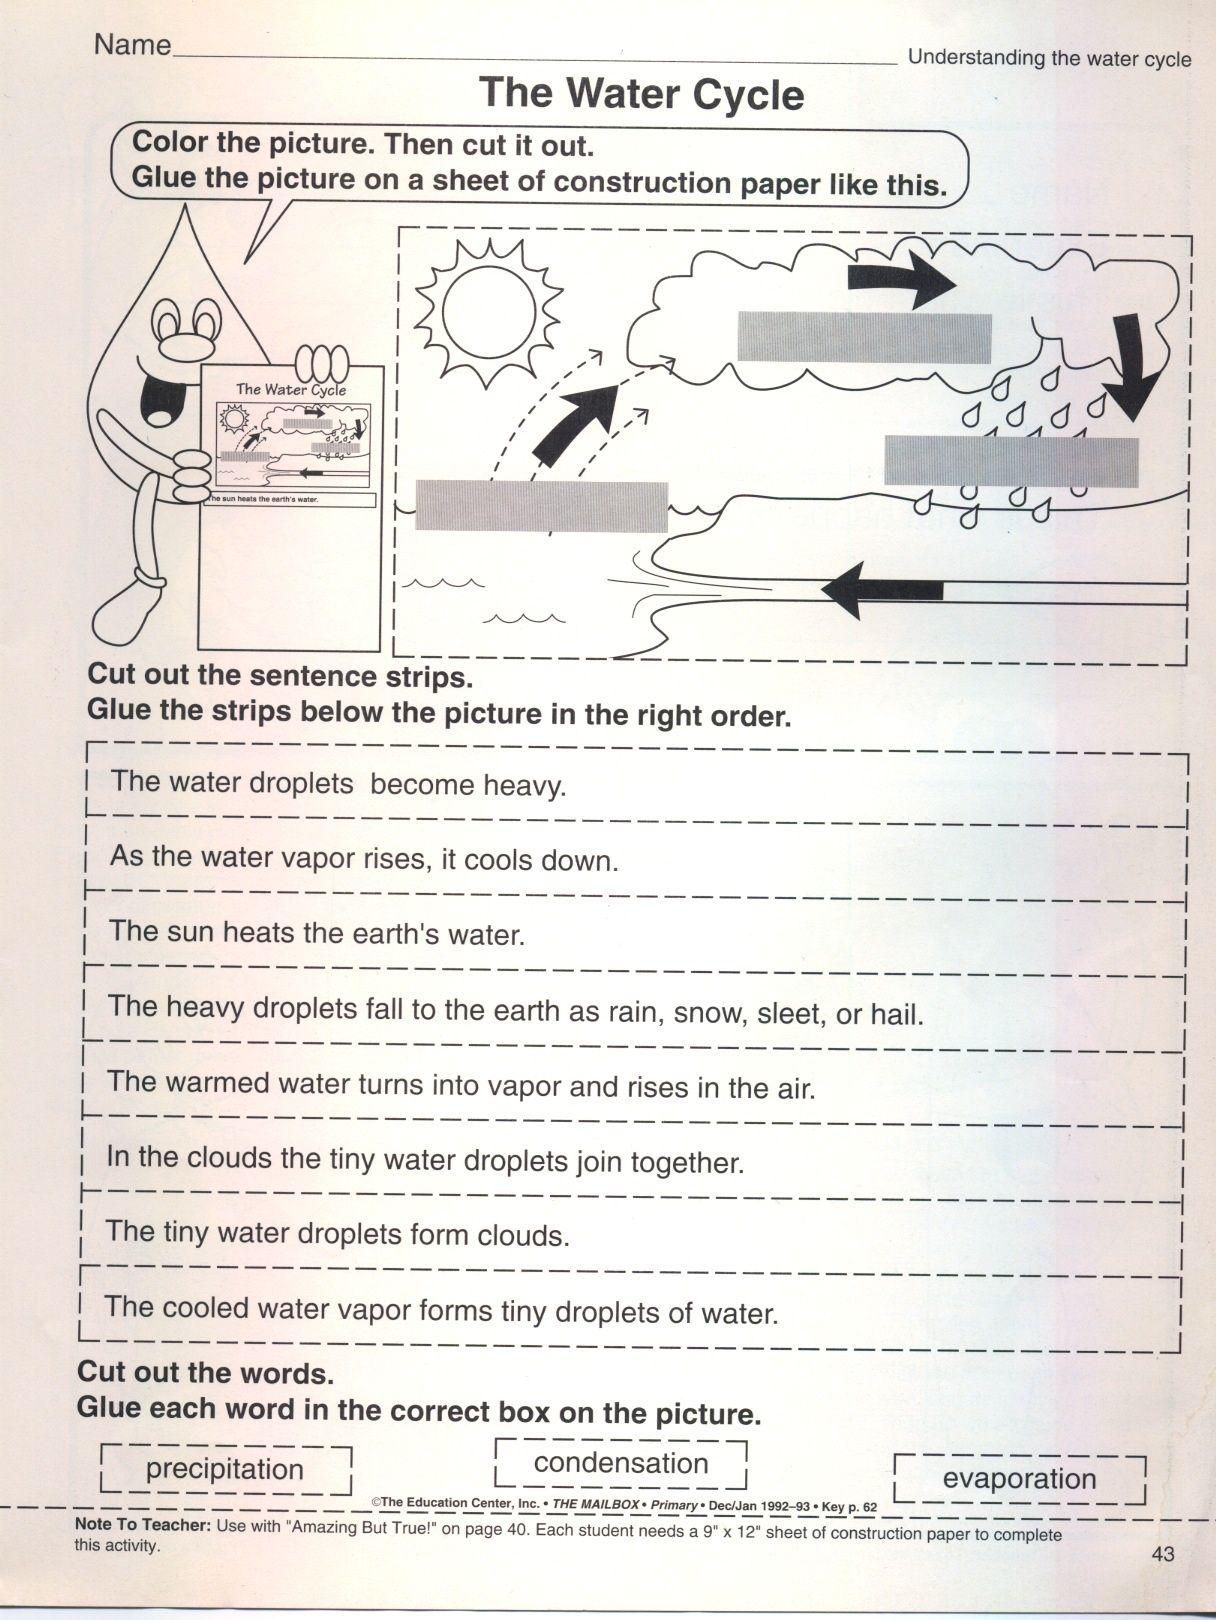 worksheet Put Sentences In Correct Order Worksheets put the water cycle in correct order worksheet dynamics cards cards